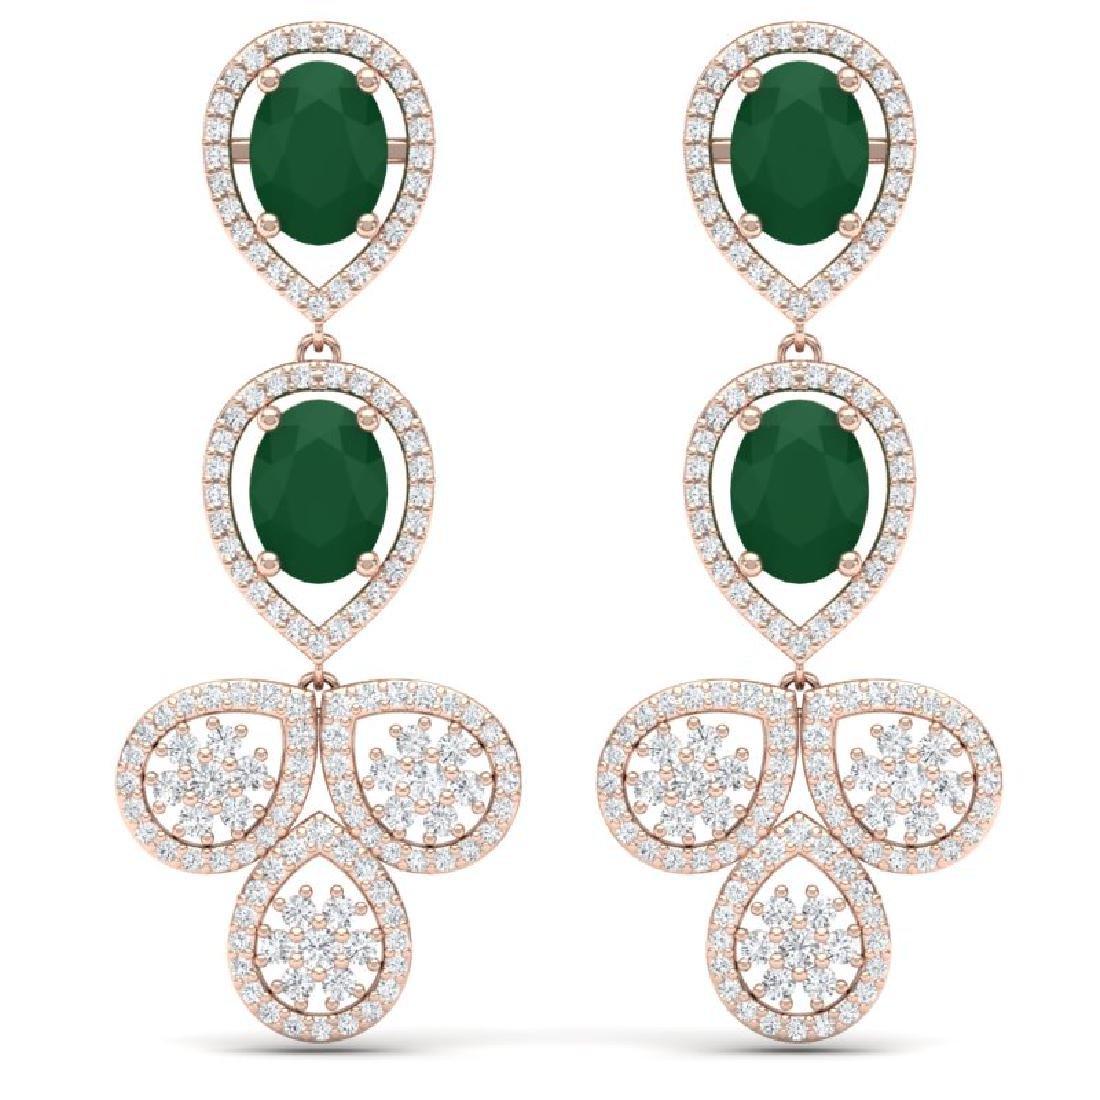 9.75 CTW Royalty Emerald & VS Diamond Earrings 18K Rose